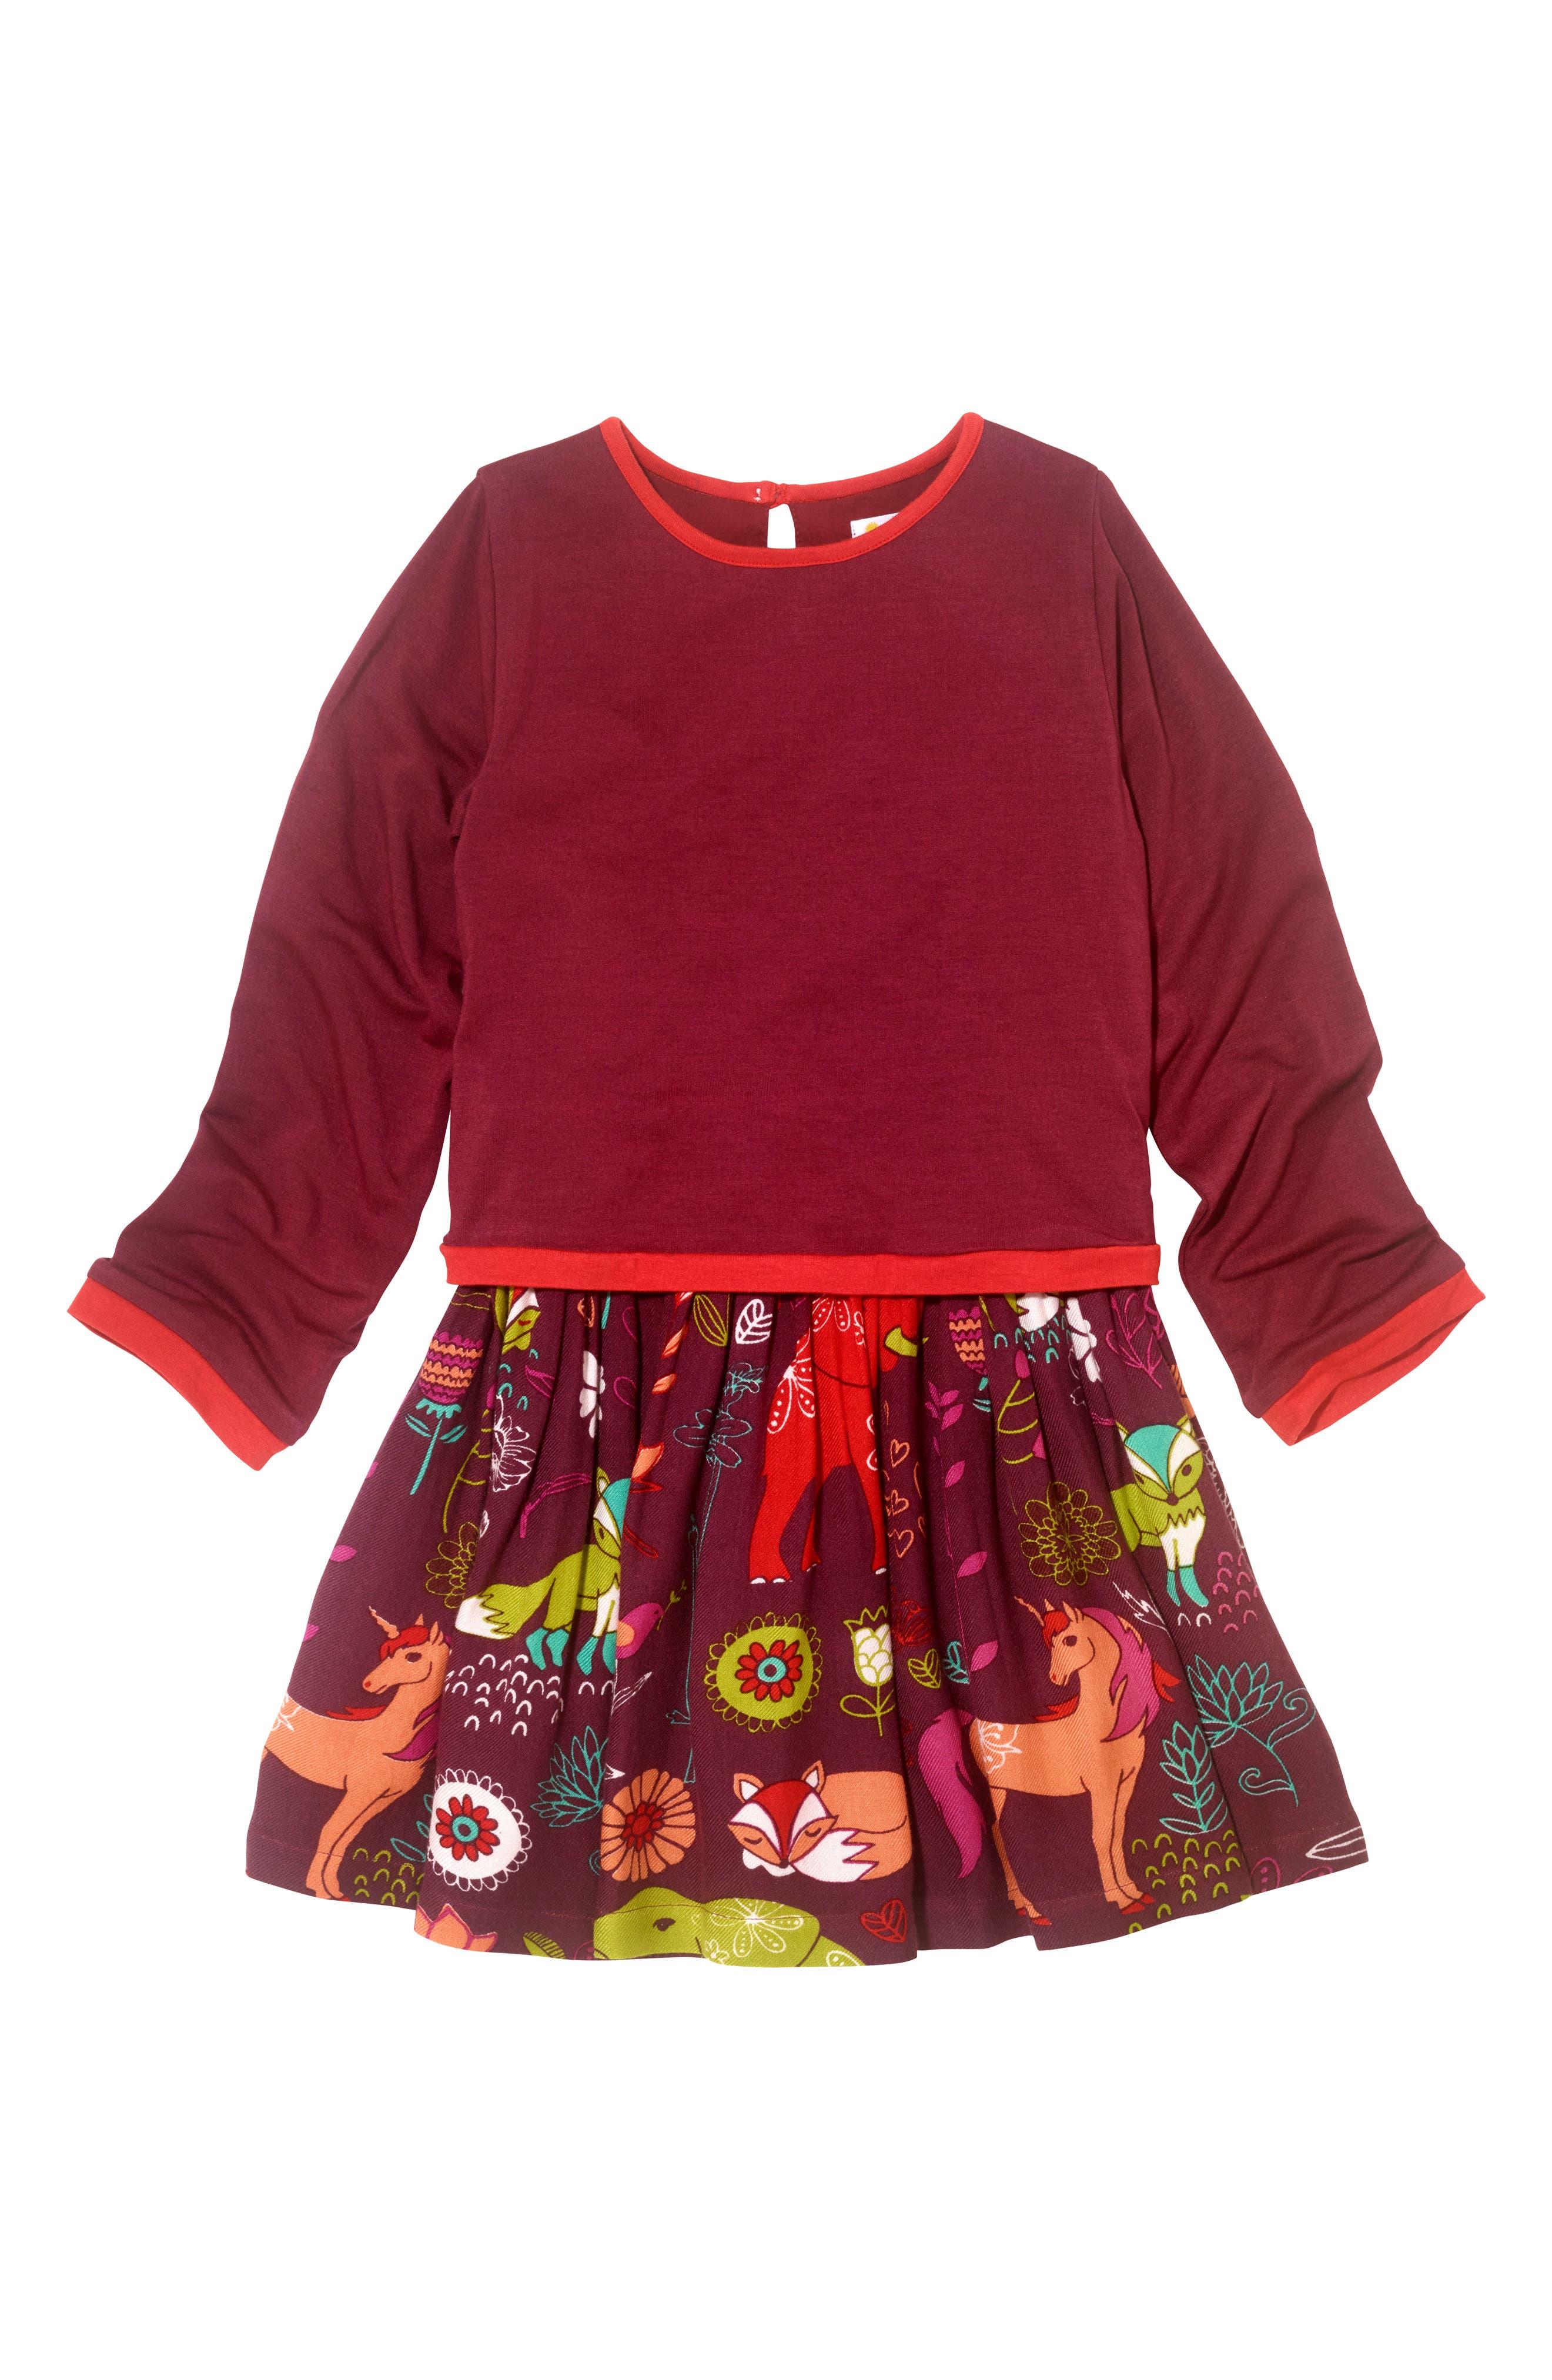 Forest Hills Dress,                             Alternate thumbnail 2, color,                             934